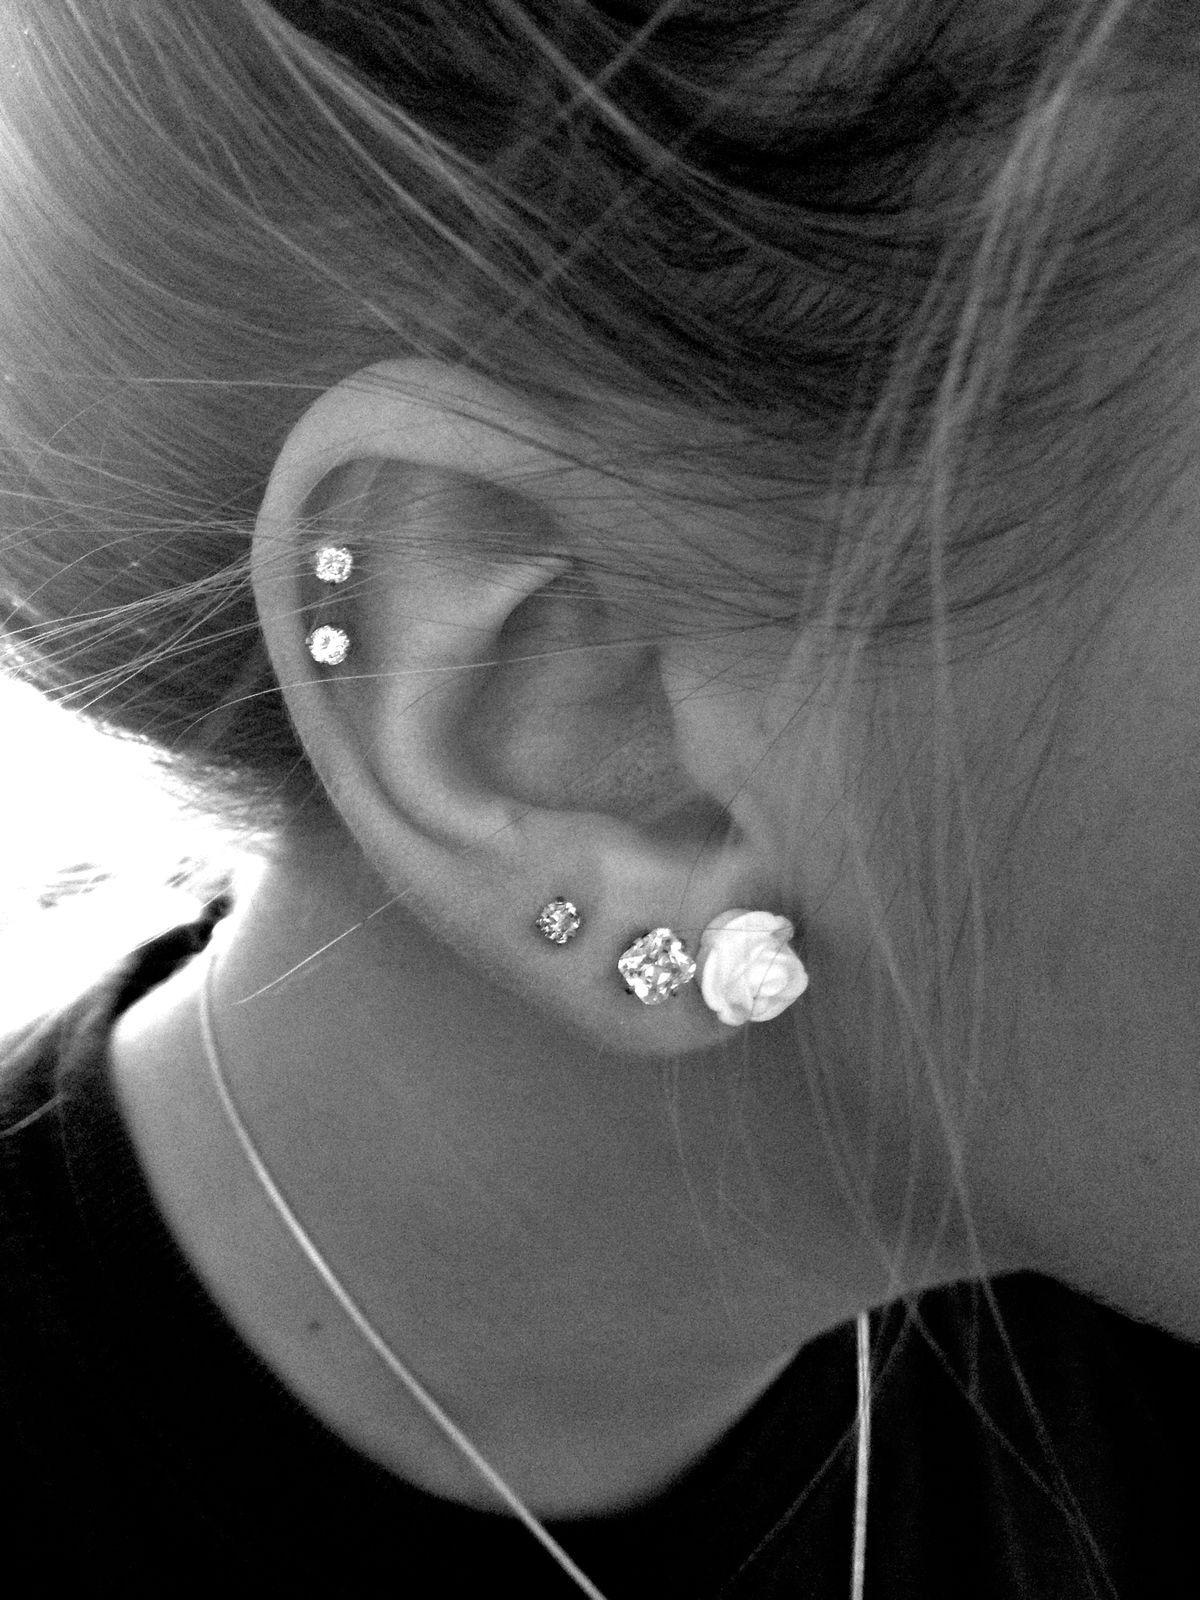 Pin Von Tiffany Fuller Auf Piercings I Love Ohrringe